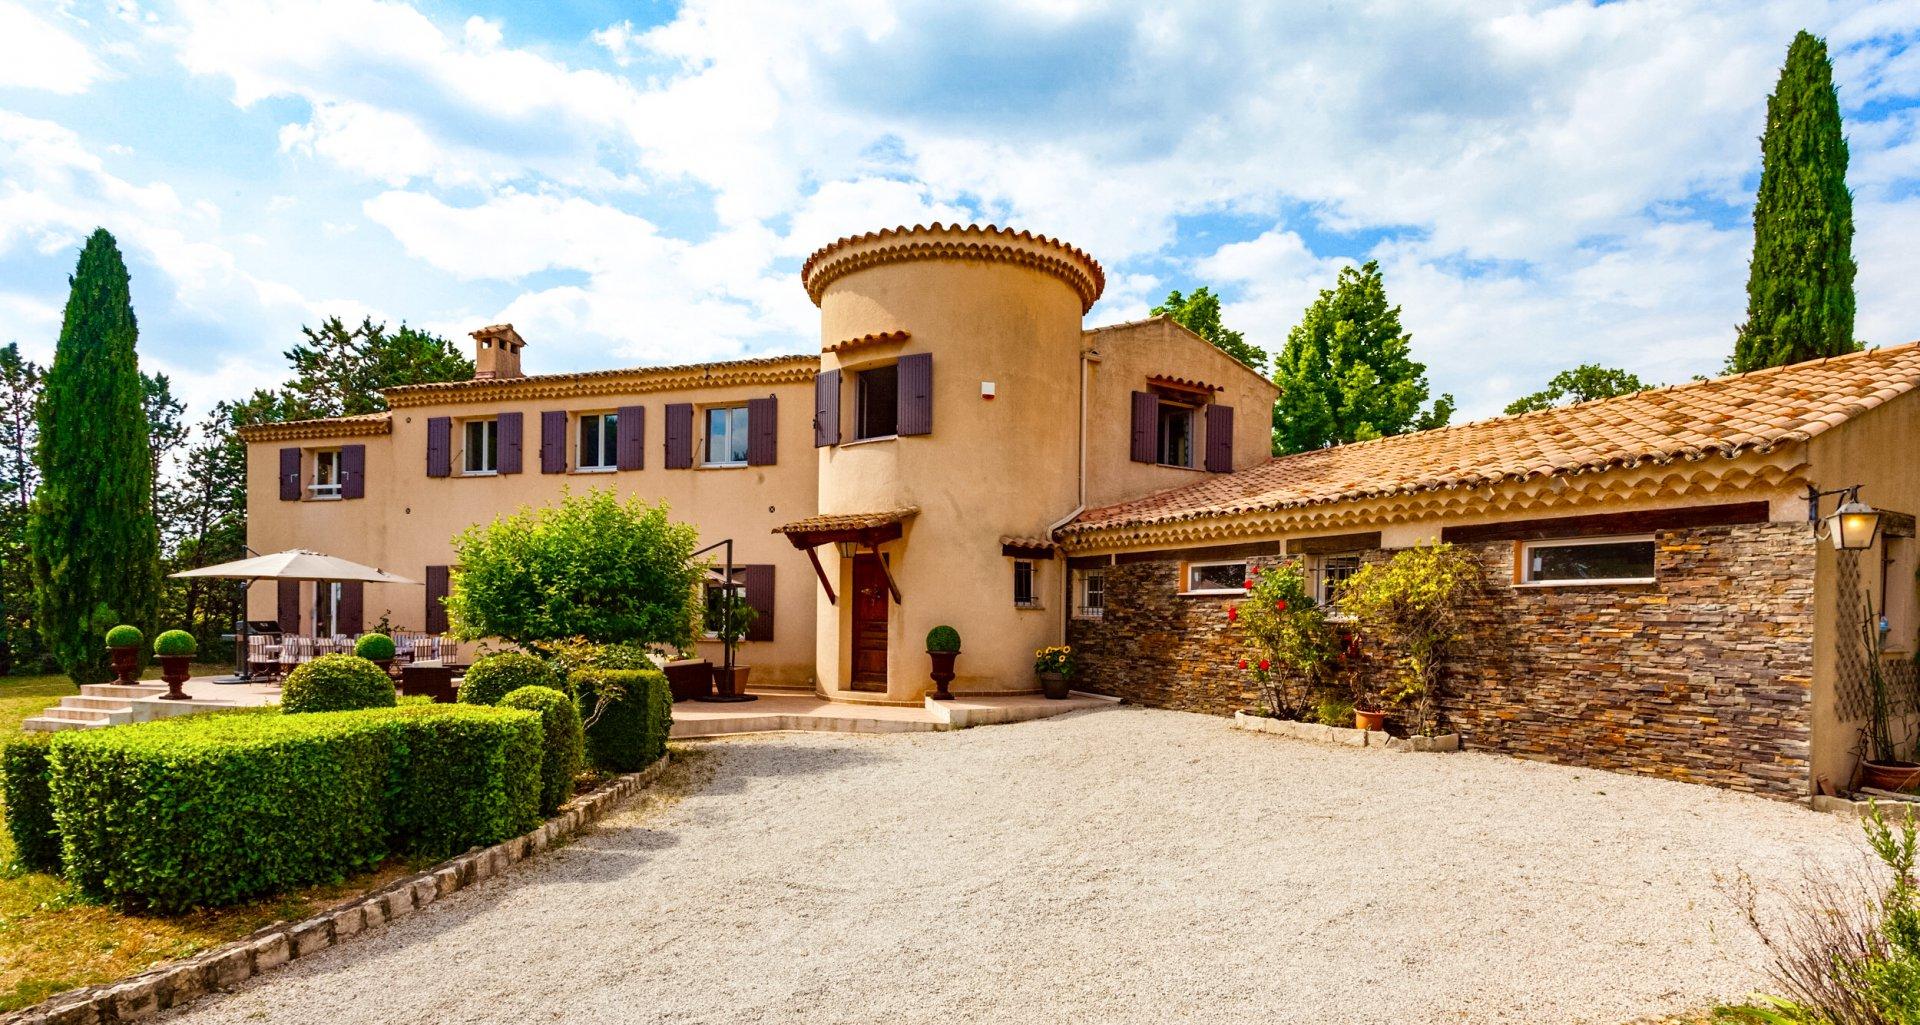 Aix en provence location villa luxe provence avec piscine privee for Location luxe